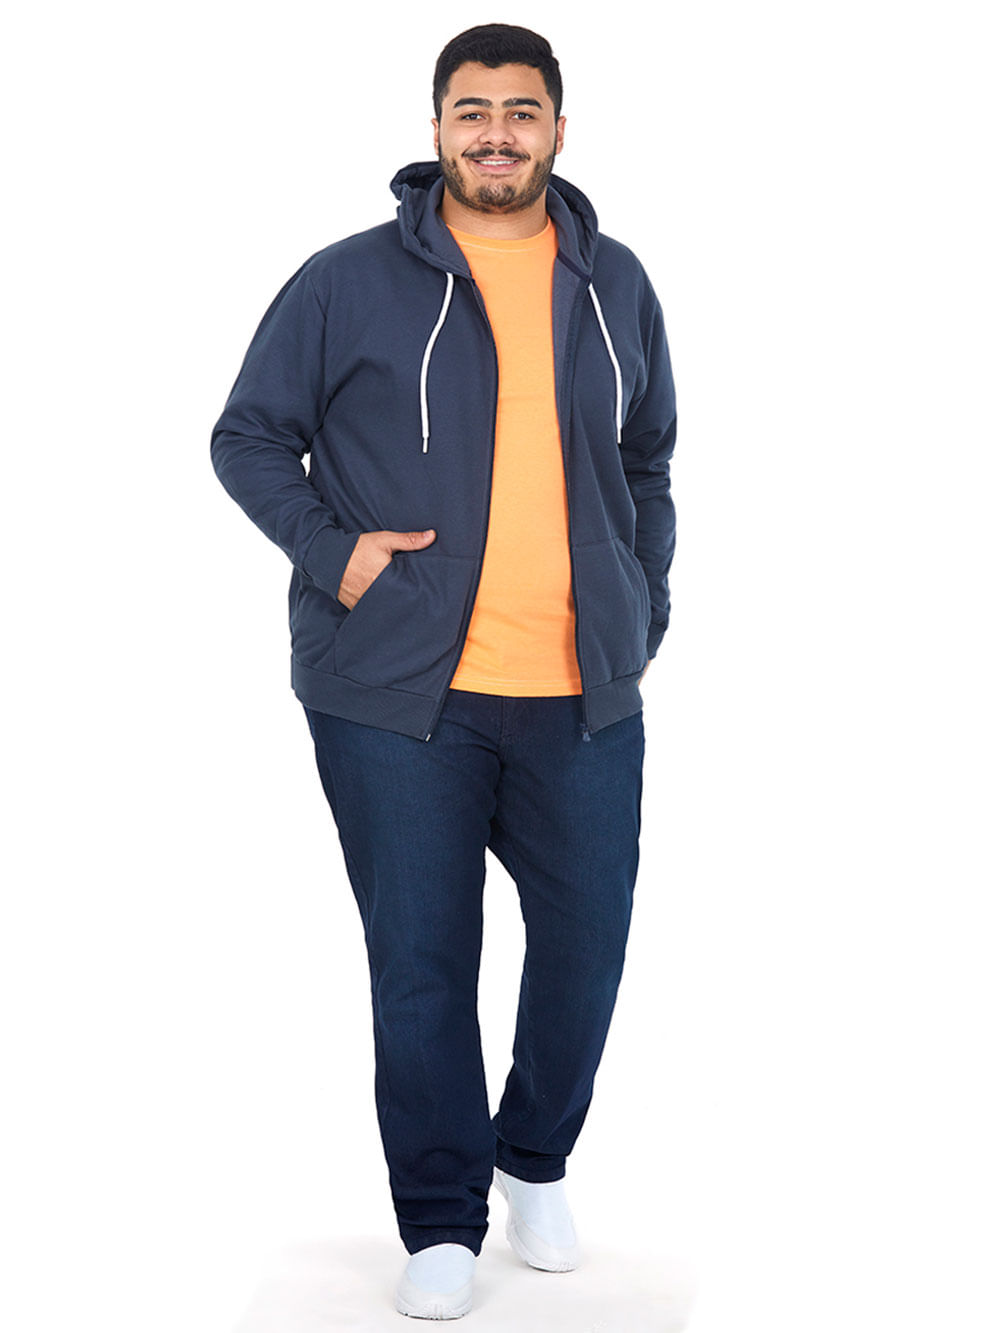 Camiseta Masculina Over Laranja Claro Polo Wear